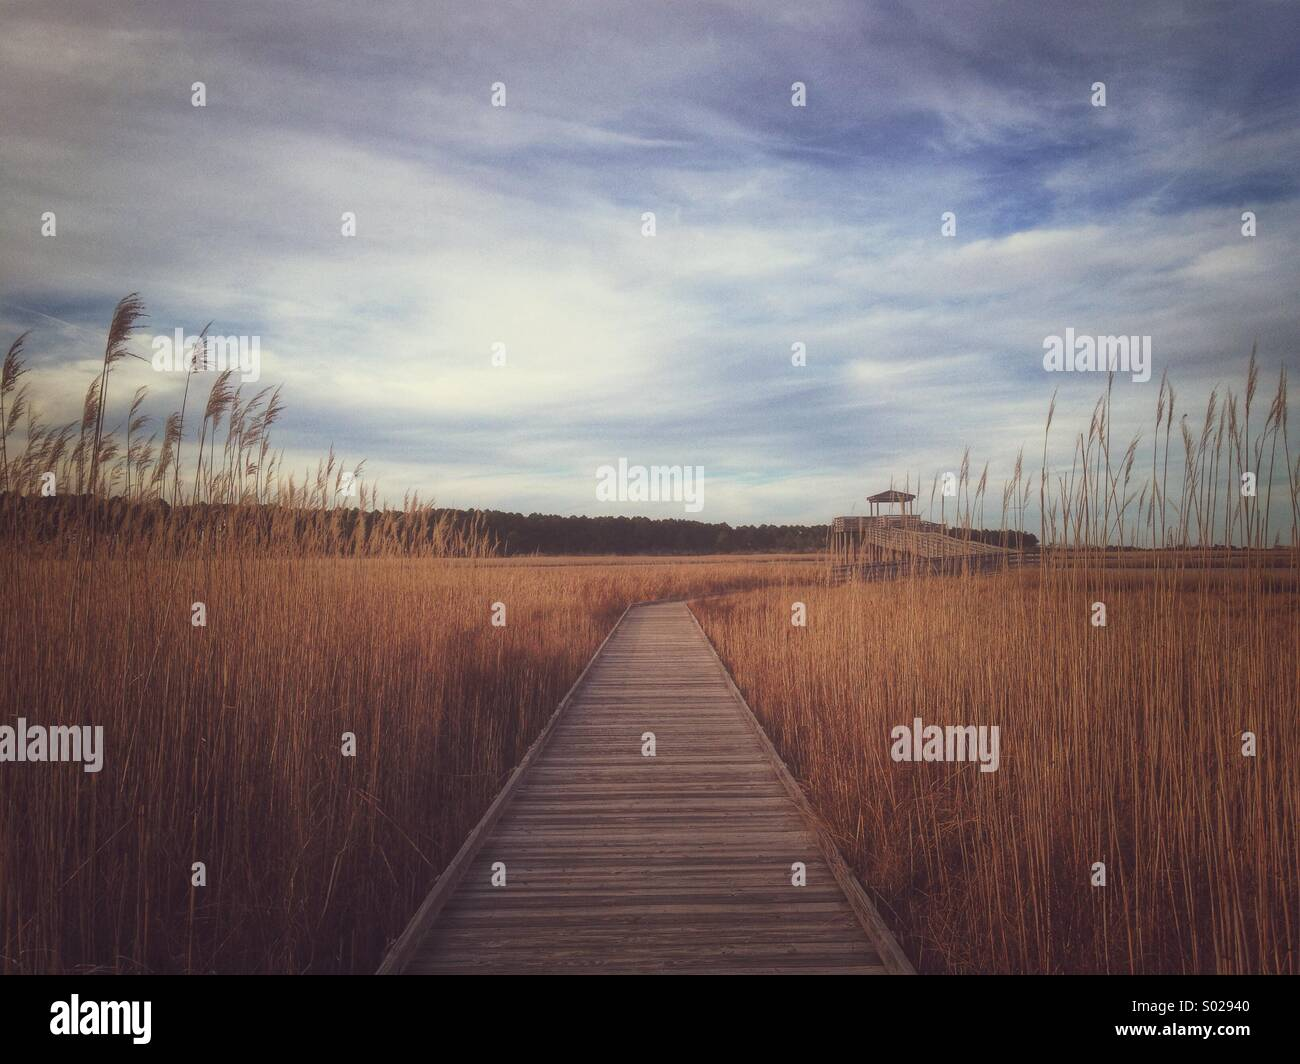 An elevated wooden walk way winds through winter wetlands - Stock Image